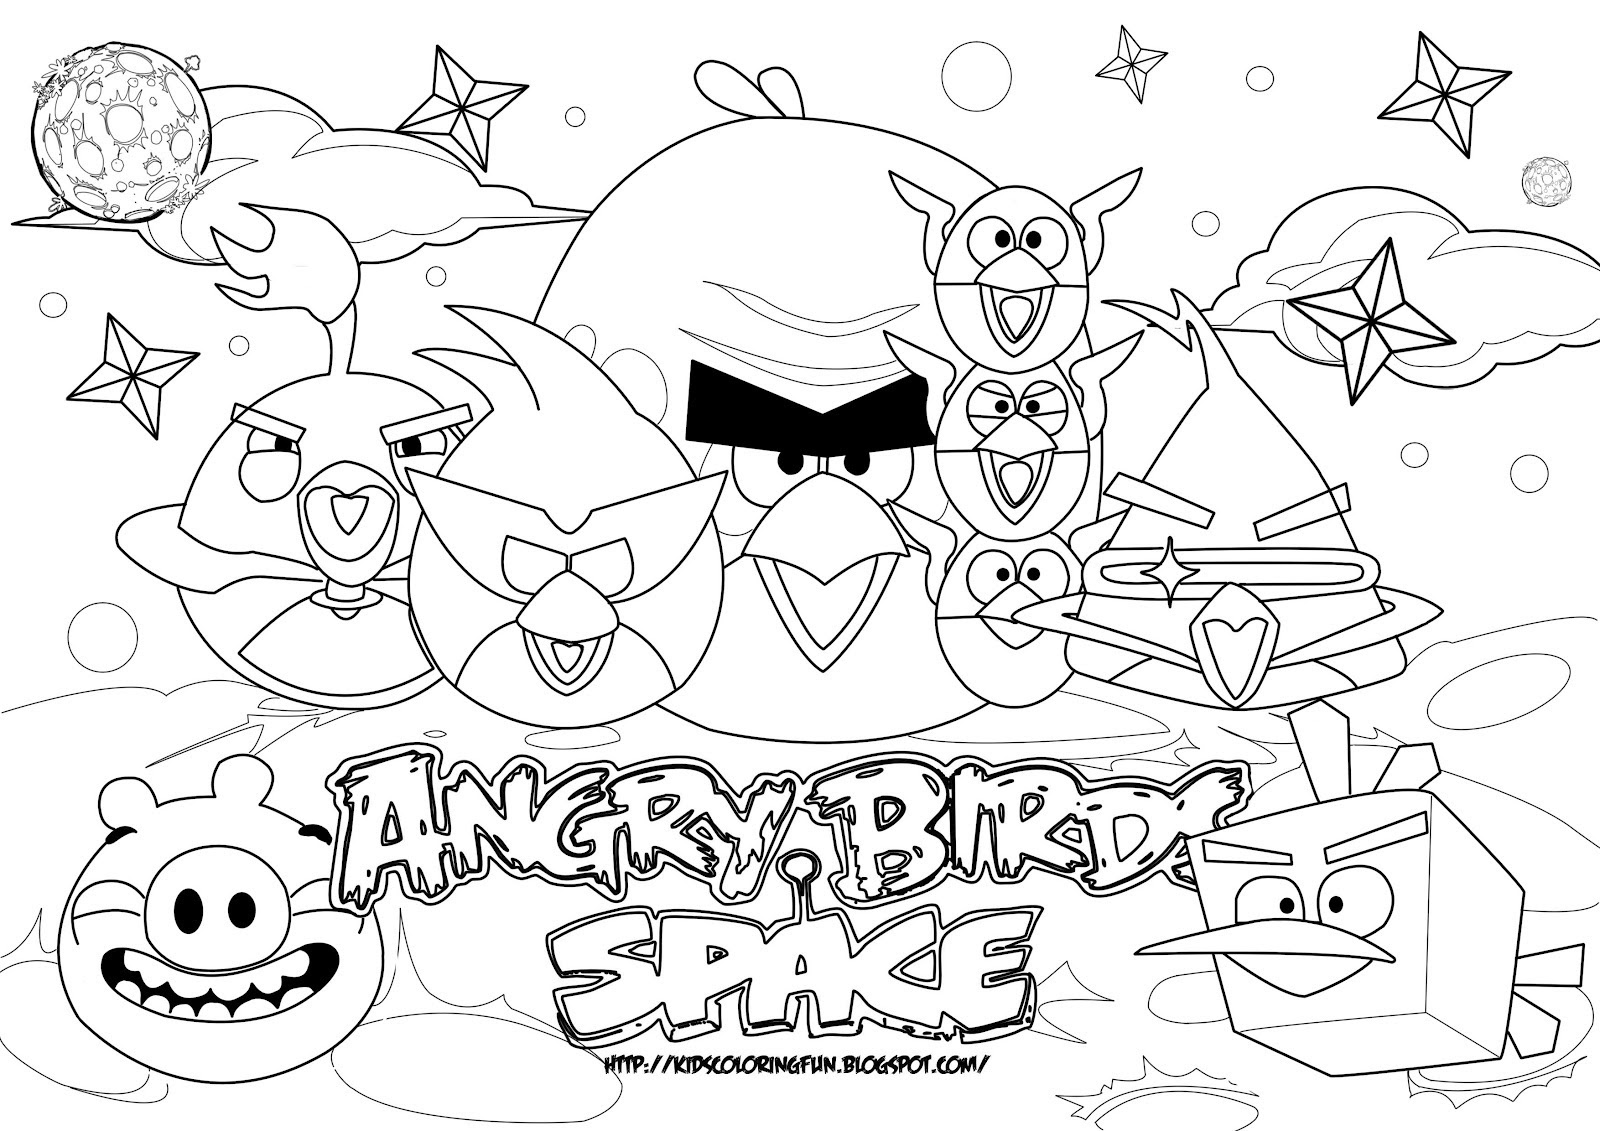 126 Dibujos De Angry Birds Para Colorear Oh Kids Page 13